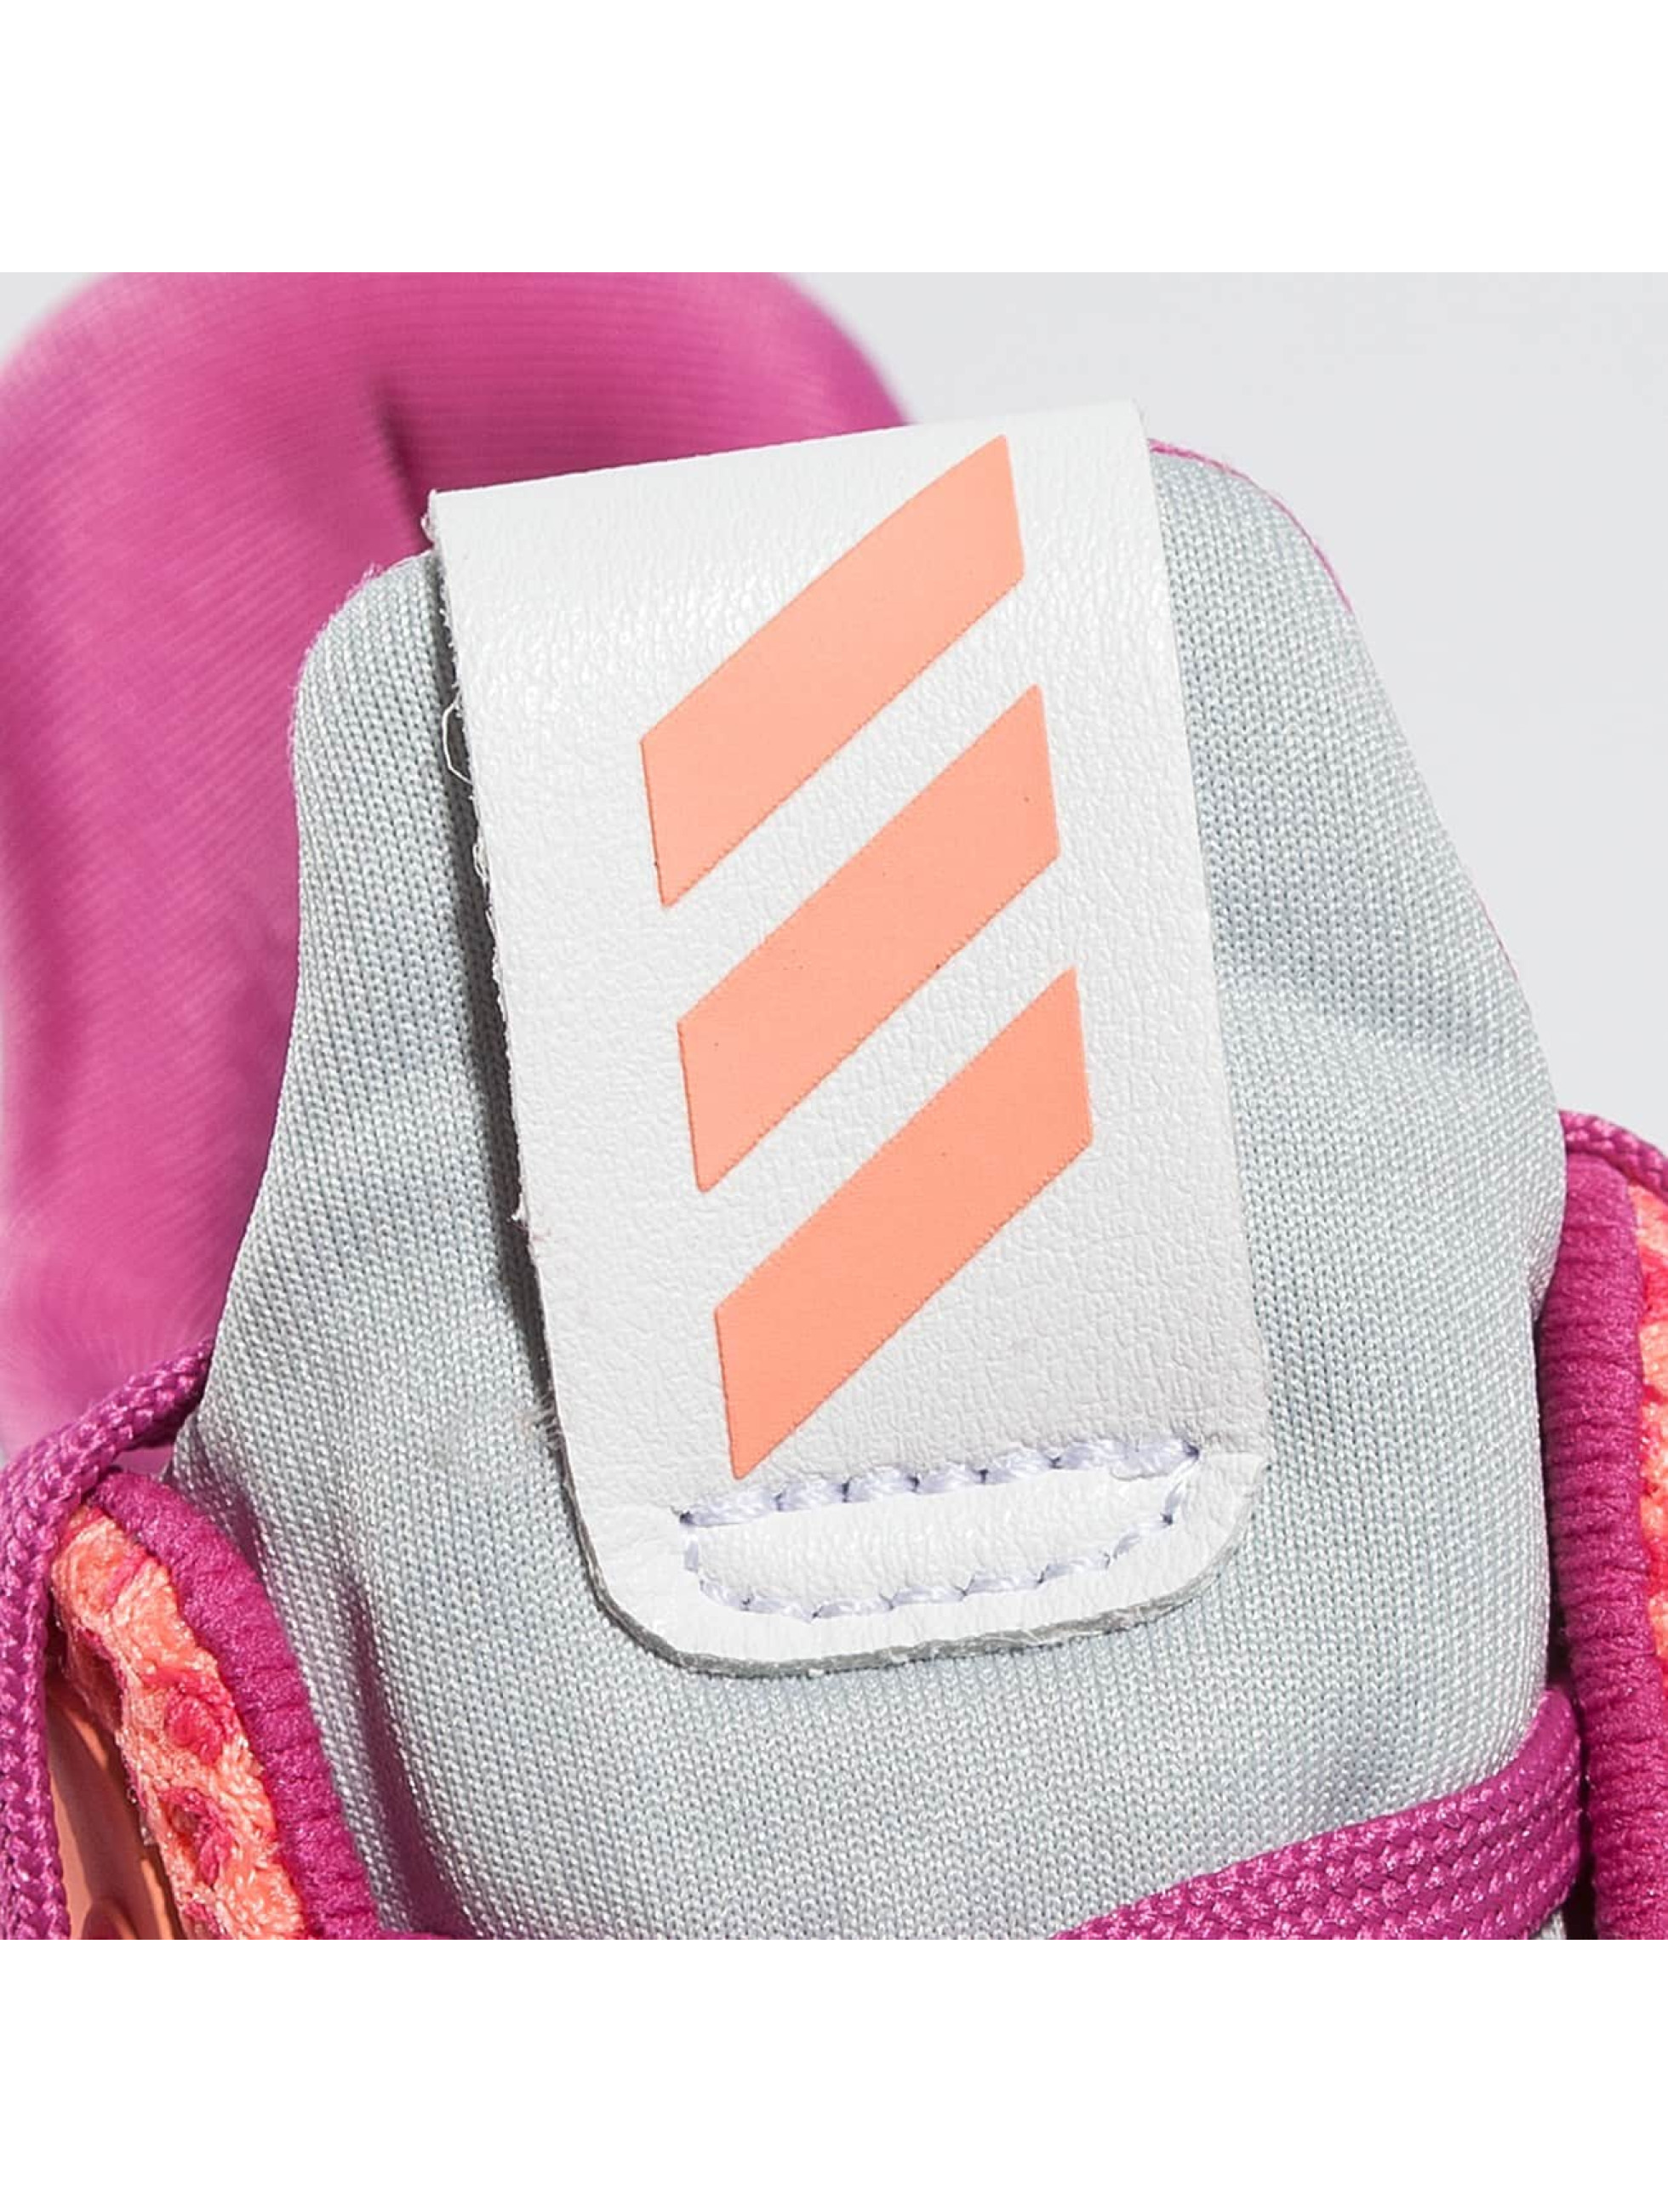 adidas Sneakers Alphabounce J pomaranczowy